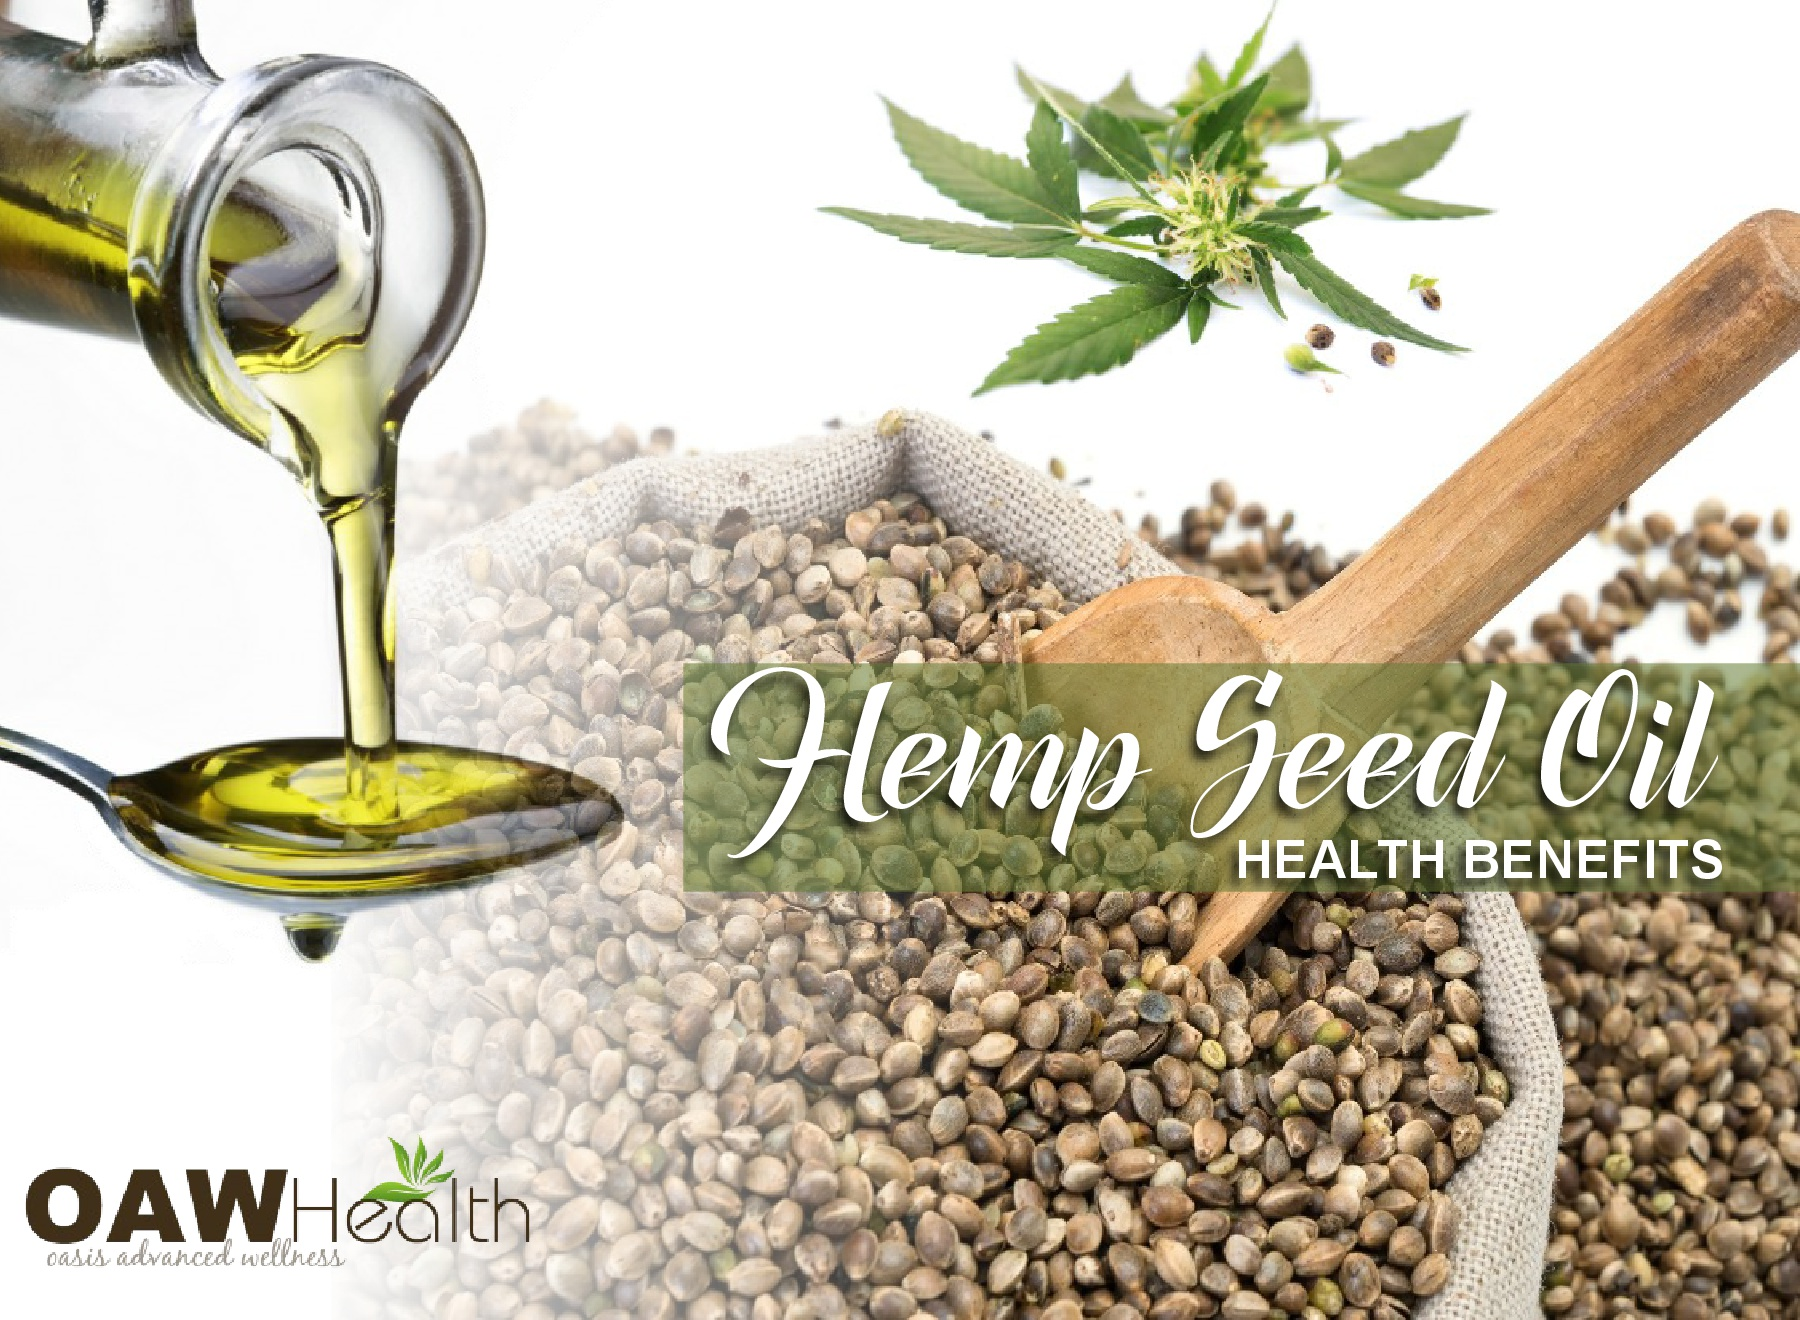 Health Benefits of Hemp Seed Oil